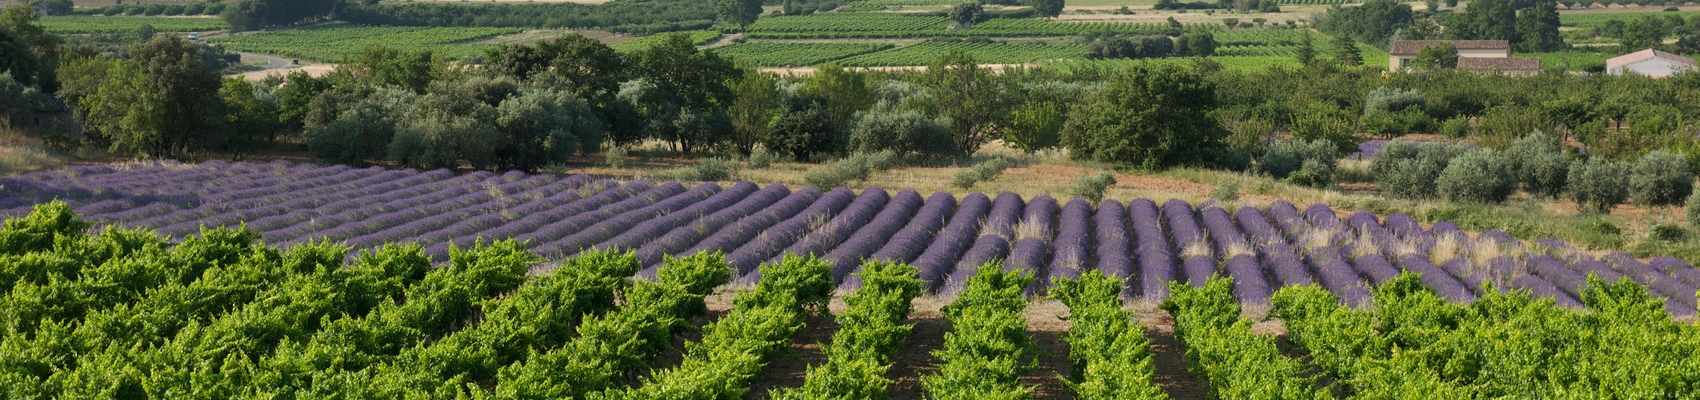 Vignobles de la Vallée du Rhône